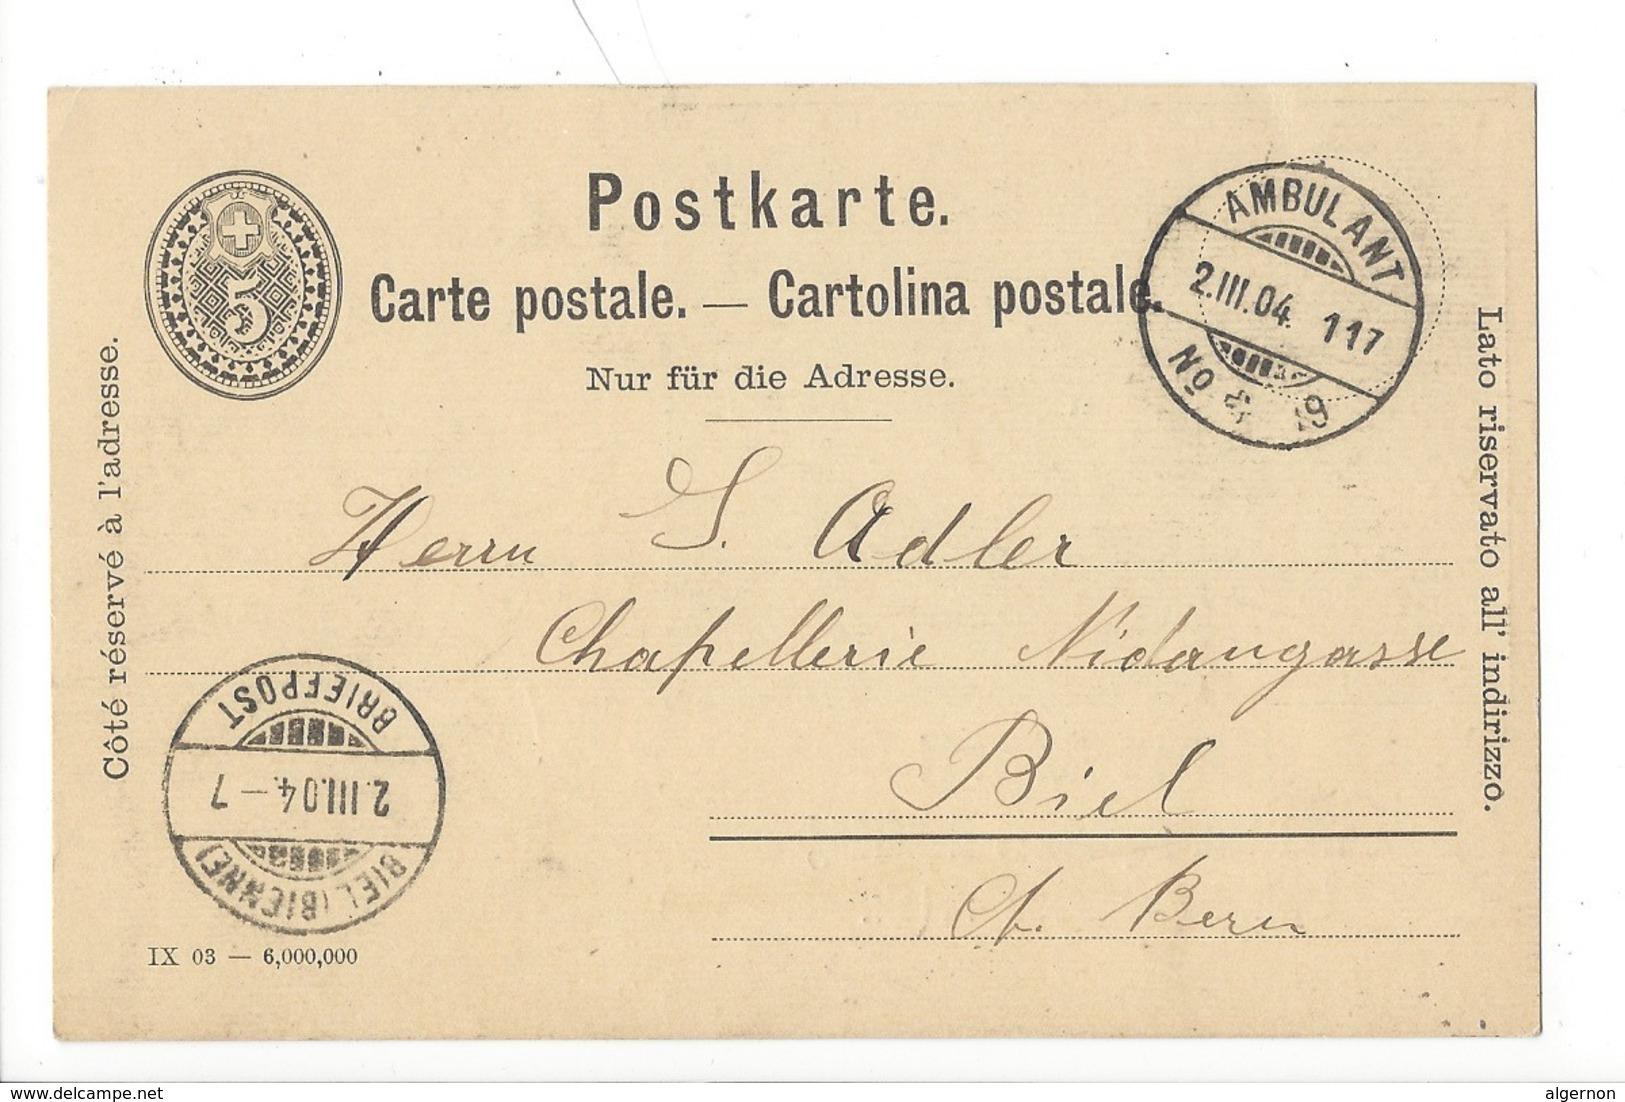 22030 - Entier Postal Privé Hans Marti Uhren Bijouterie-Handlung Bahnhofstrasse Frick Ambulant  Biel 02.03.1904 - Entiers Postaux